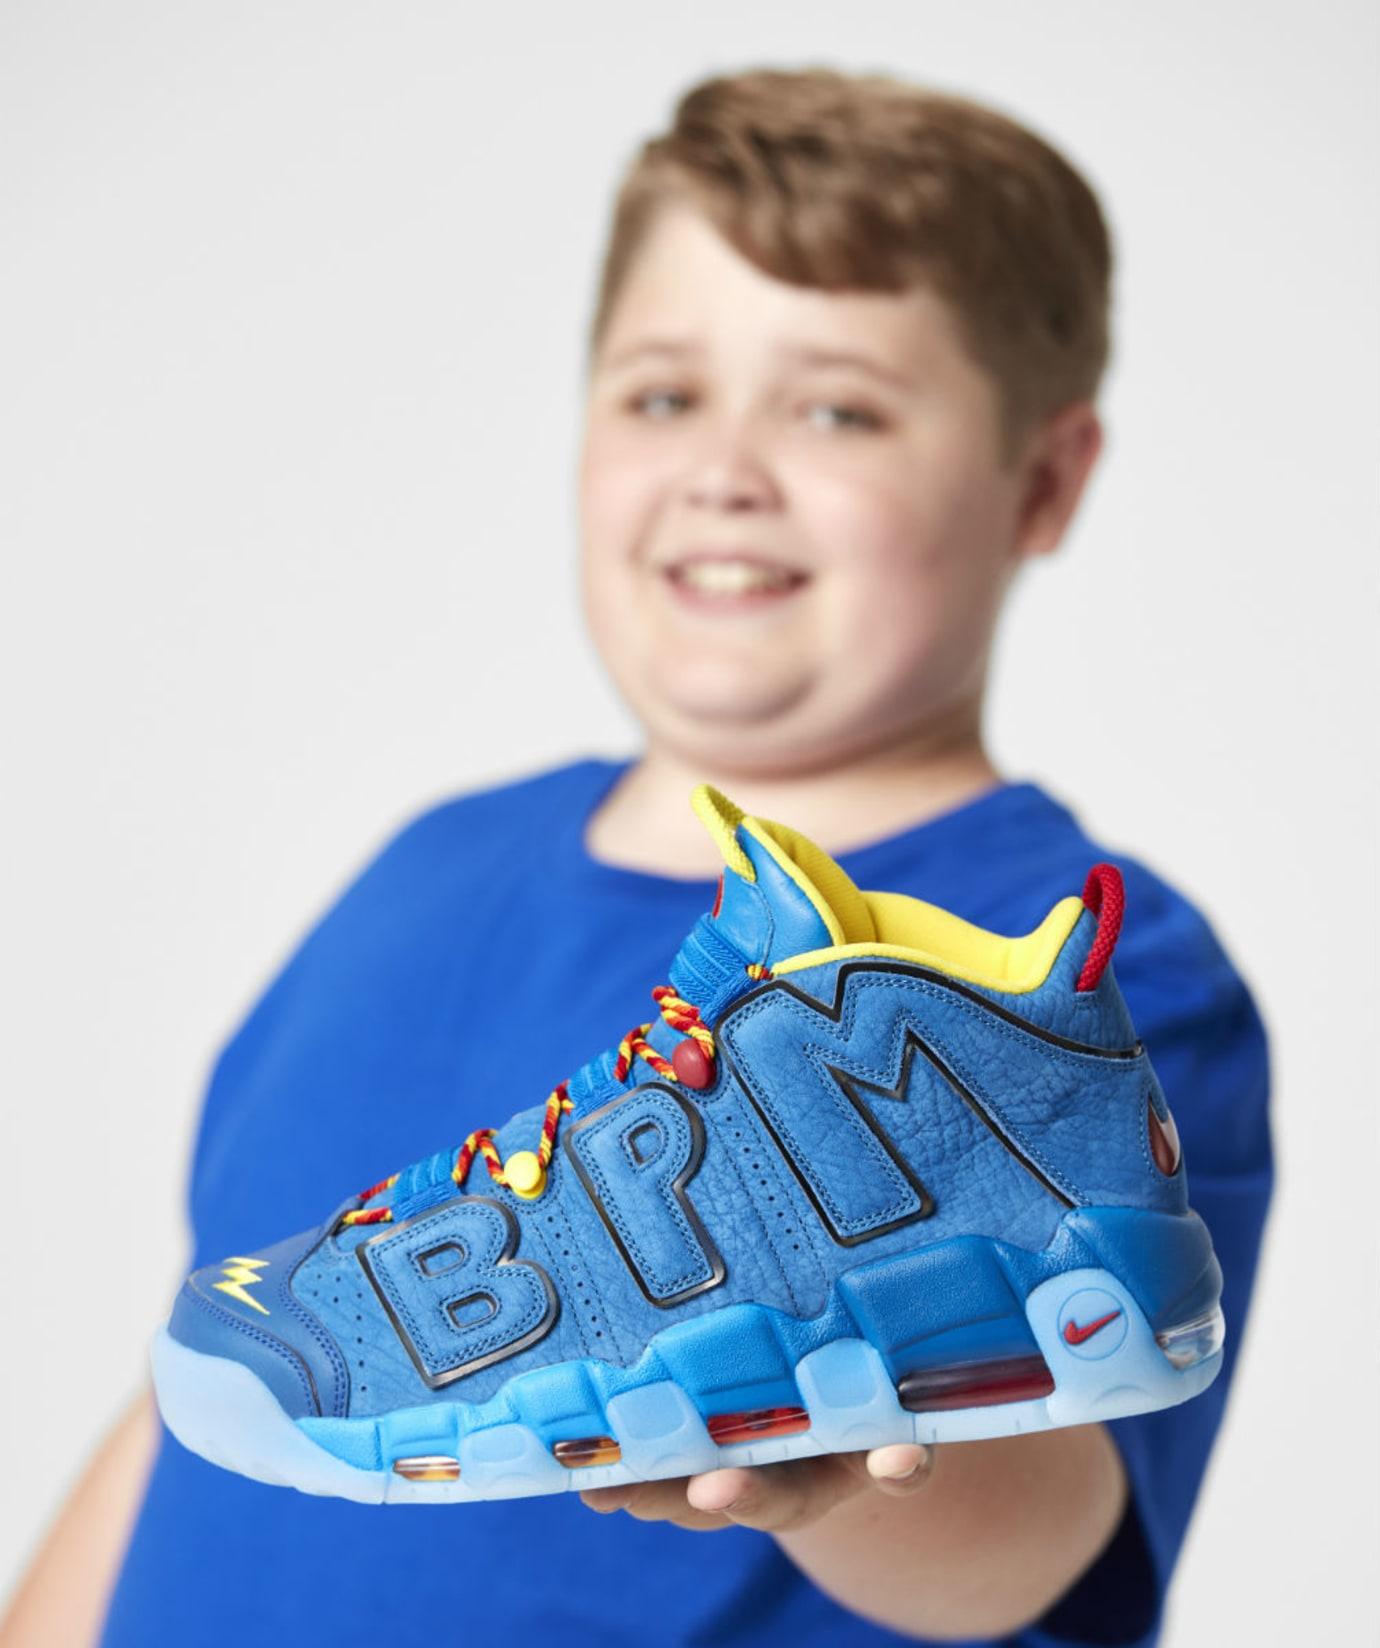 Nike Air More Uptempo Doernbecher Brody Miller Release Date AH6949-446 In-Hand